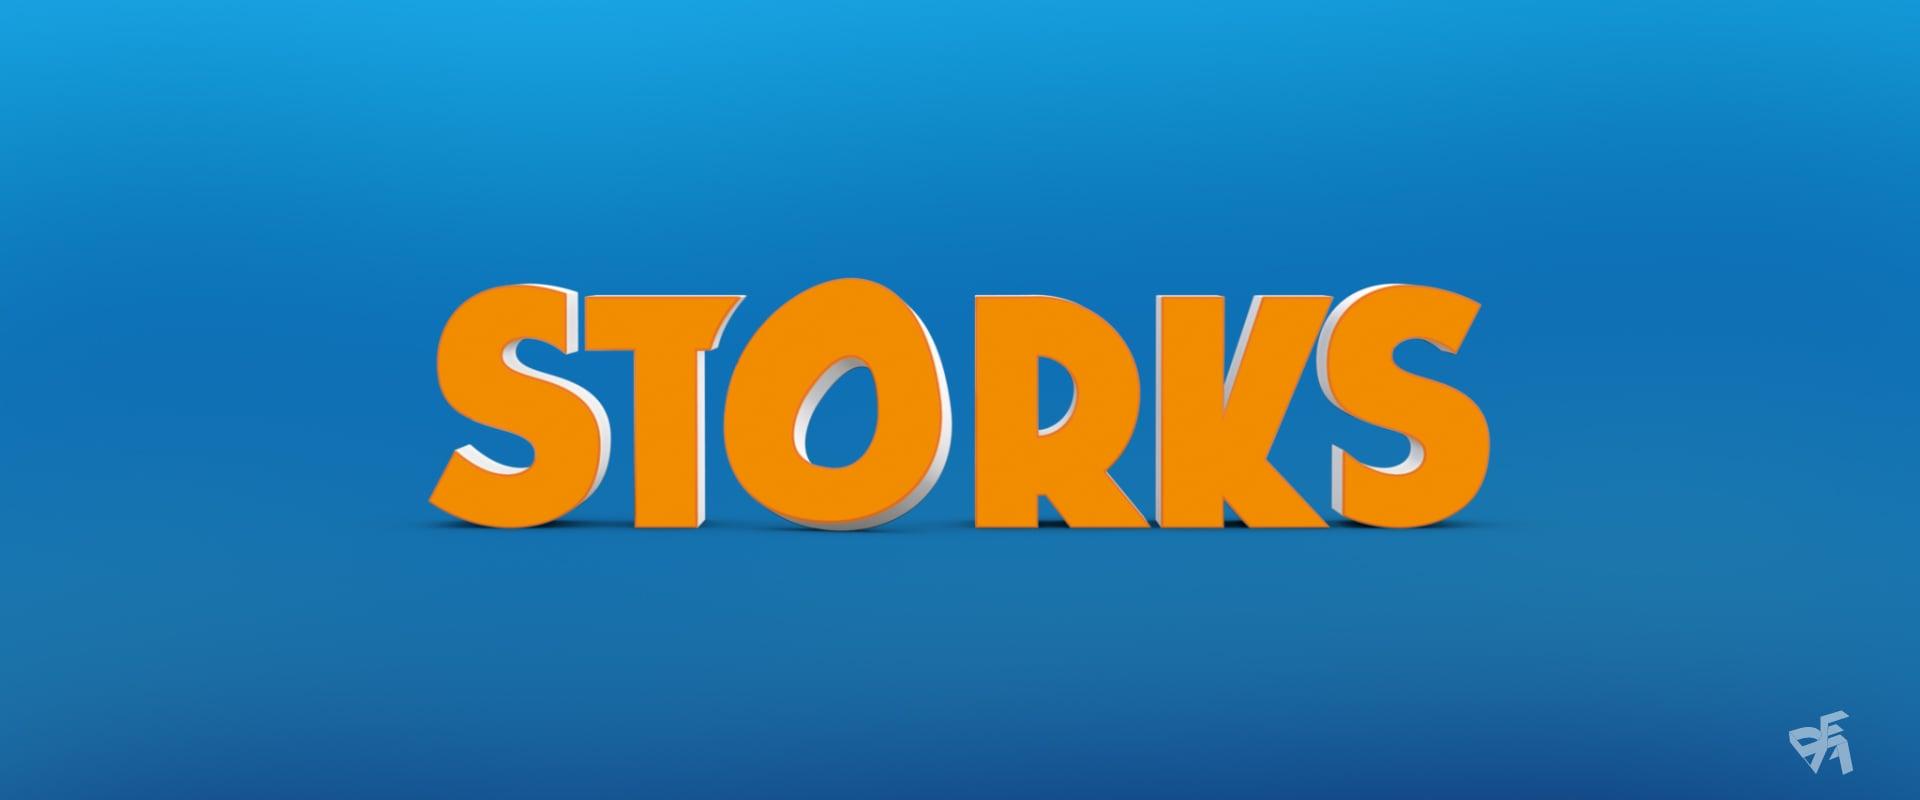 Storks-TRAILERSTILL-devaGFX_06.jpg